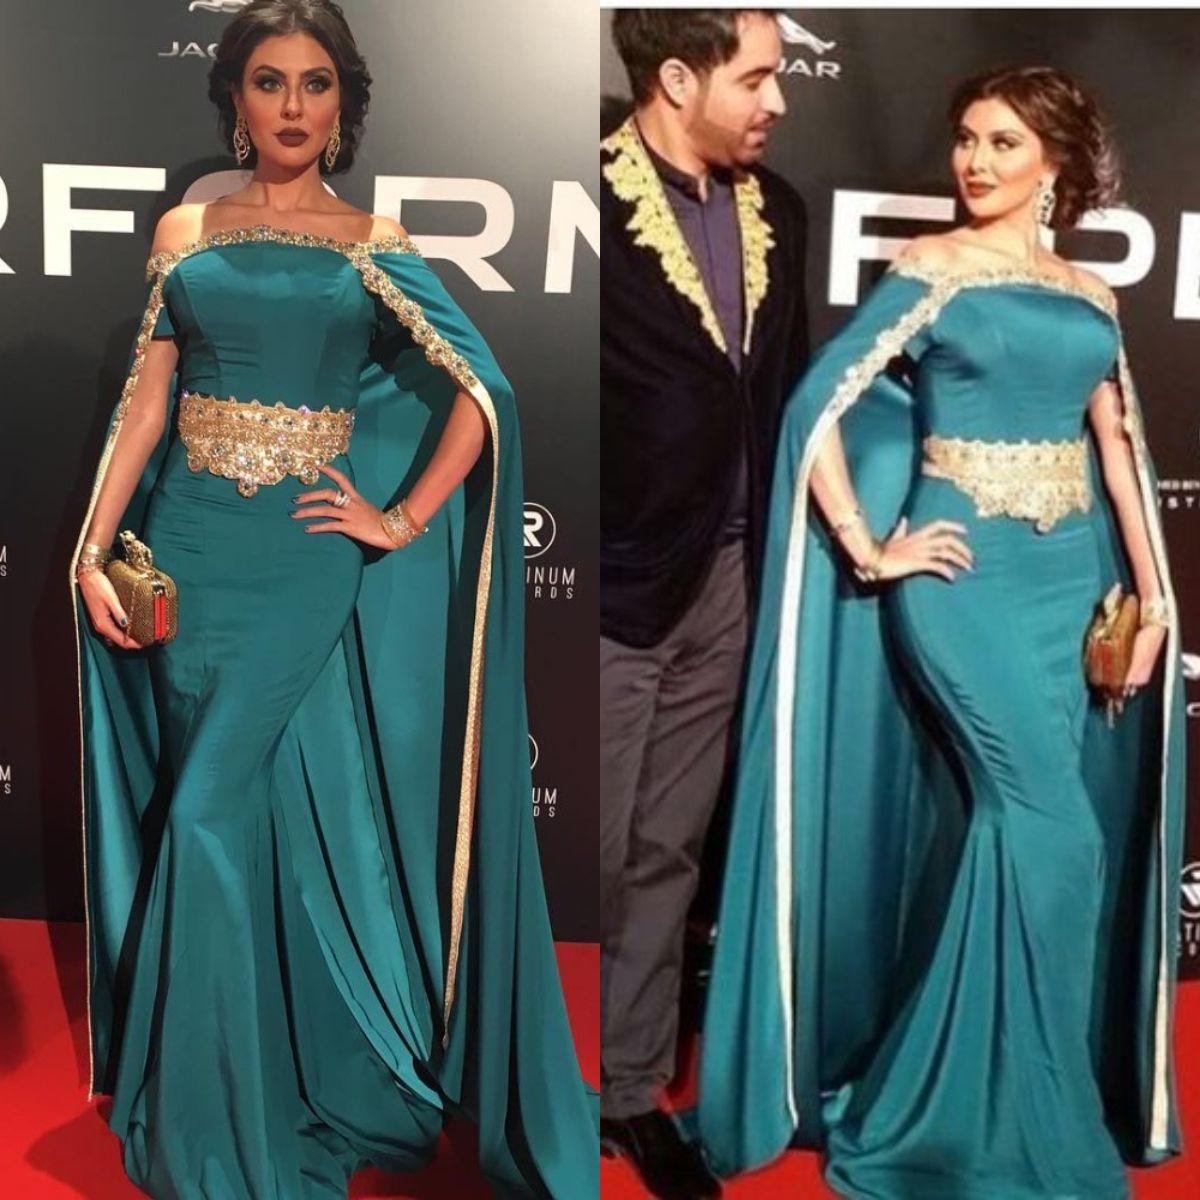 45883e93a7213 Fashionable Pakistani Dubai Evening Dresses Saudi Arabia Elegant Cape  Crystal Off Shoulder Prom Gowns Satin Elegant robes de soirée femme